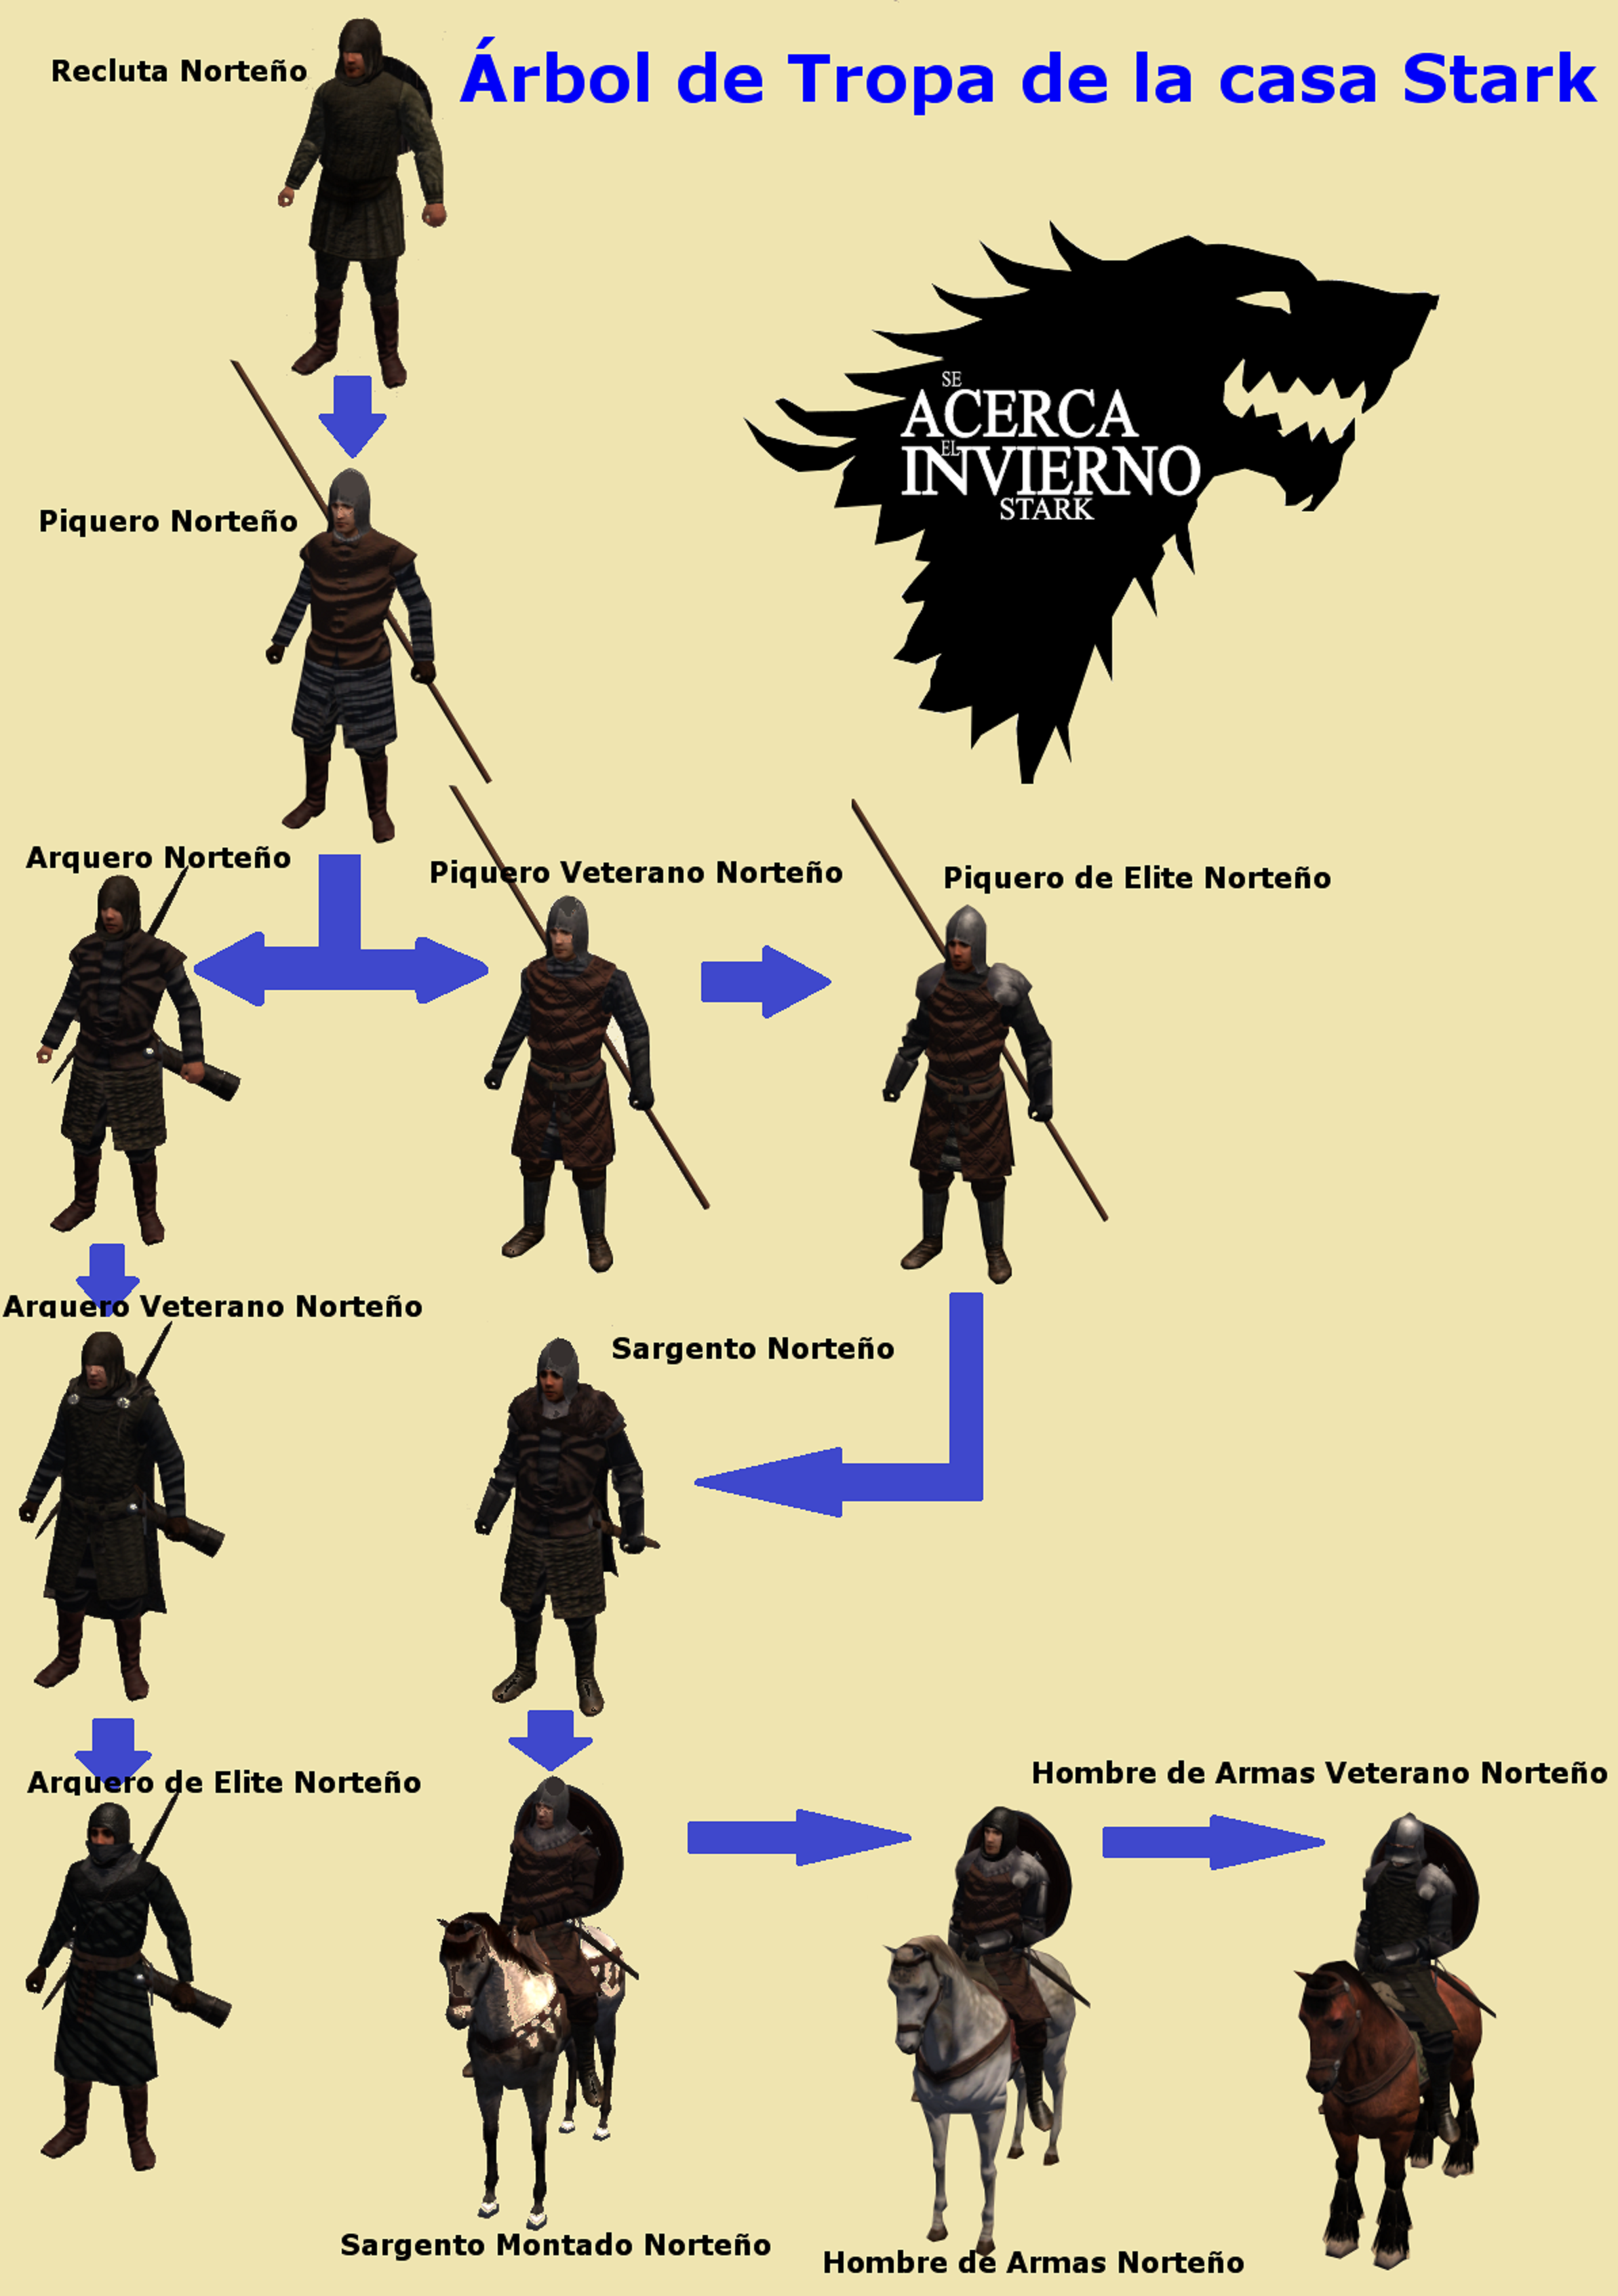 [A Clash of Kings] - Arboles de tropas & Bandidos A2e2i